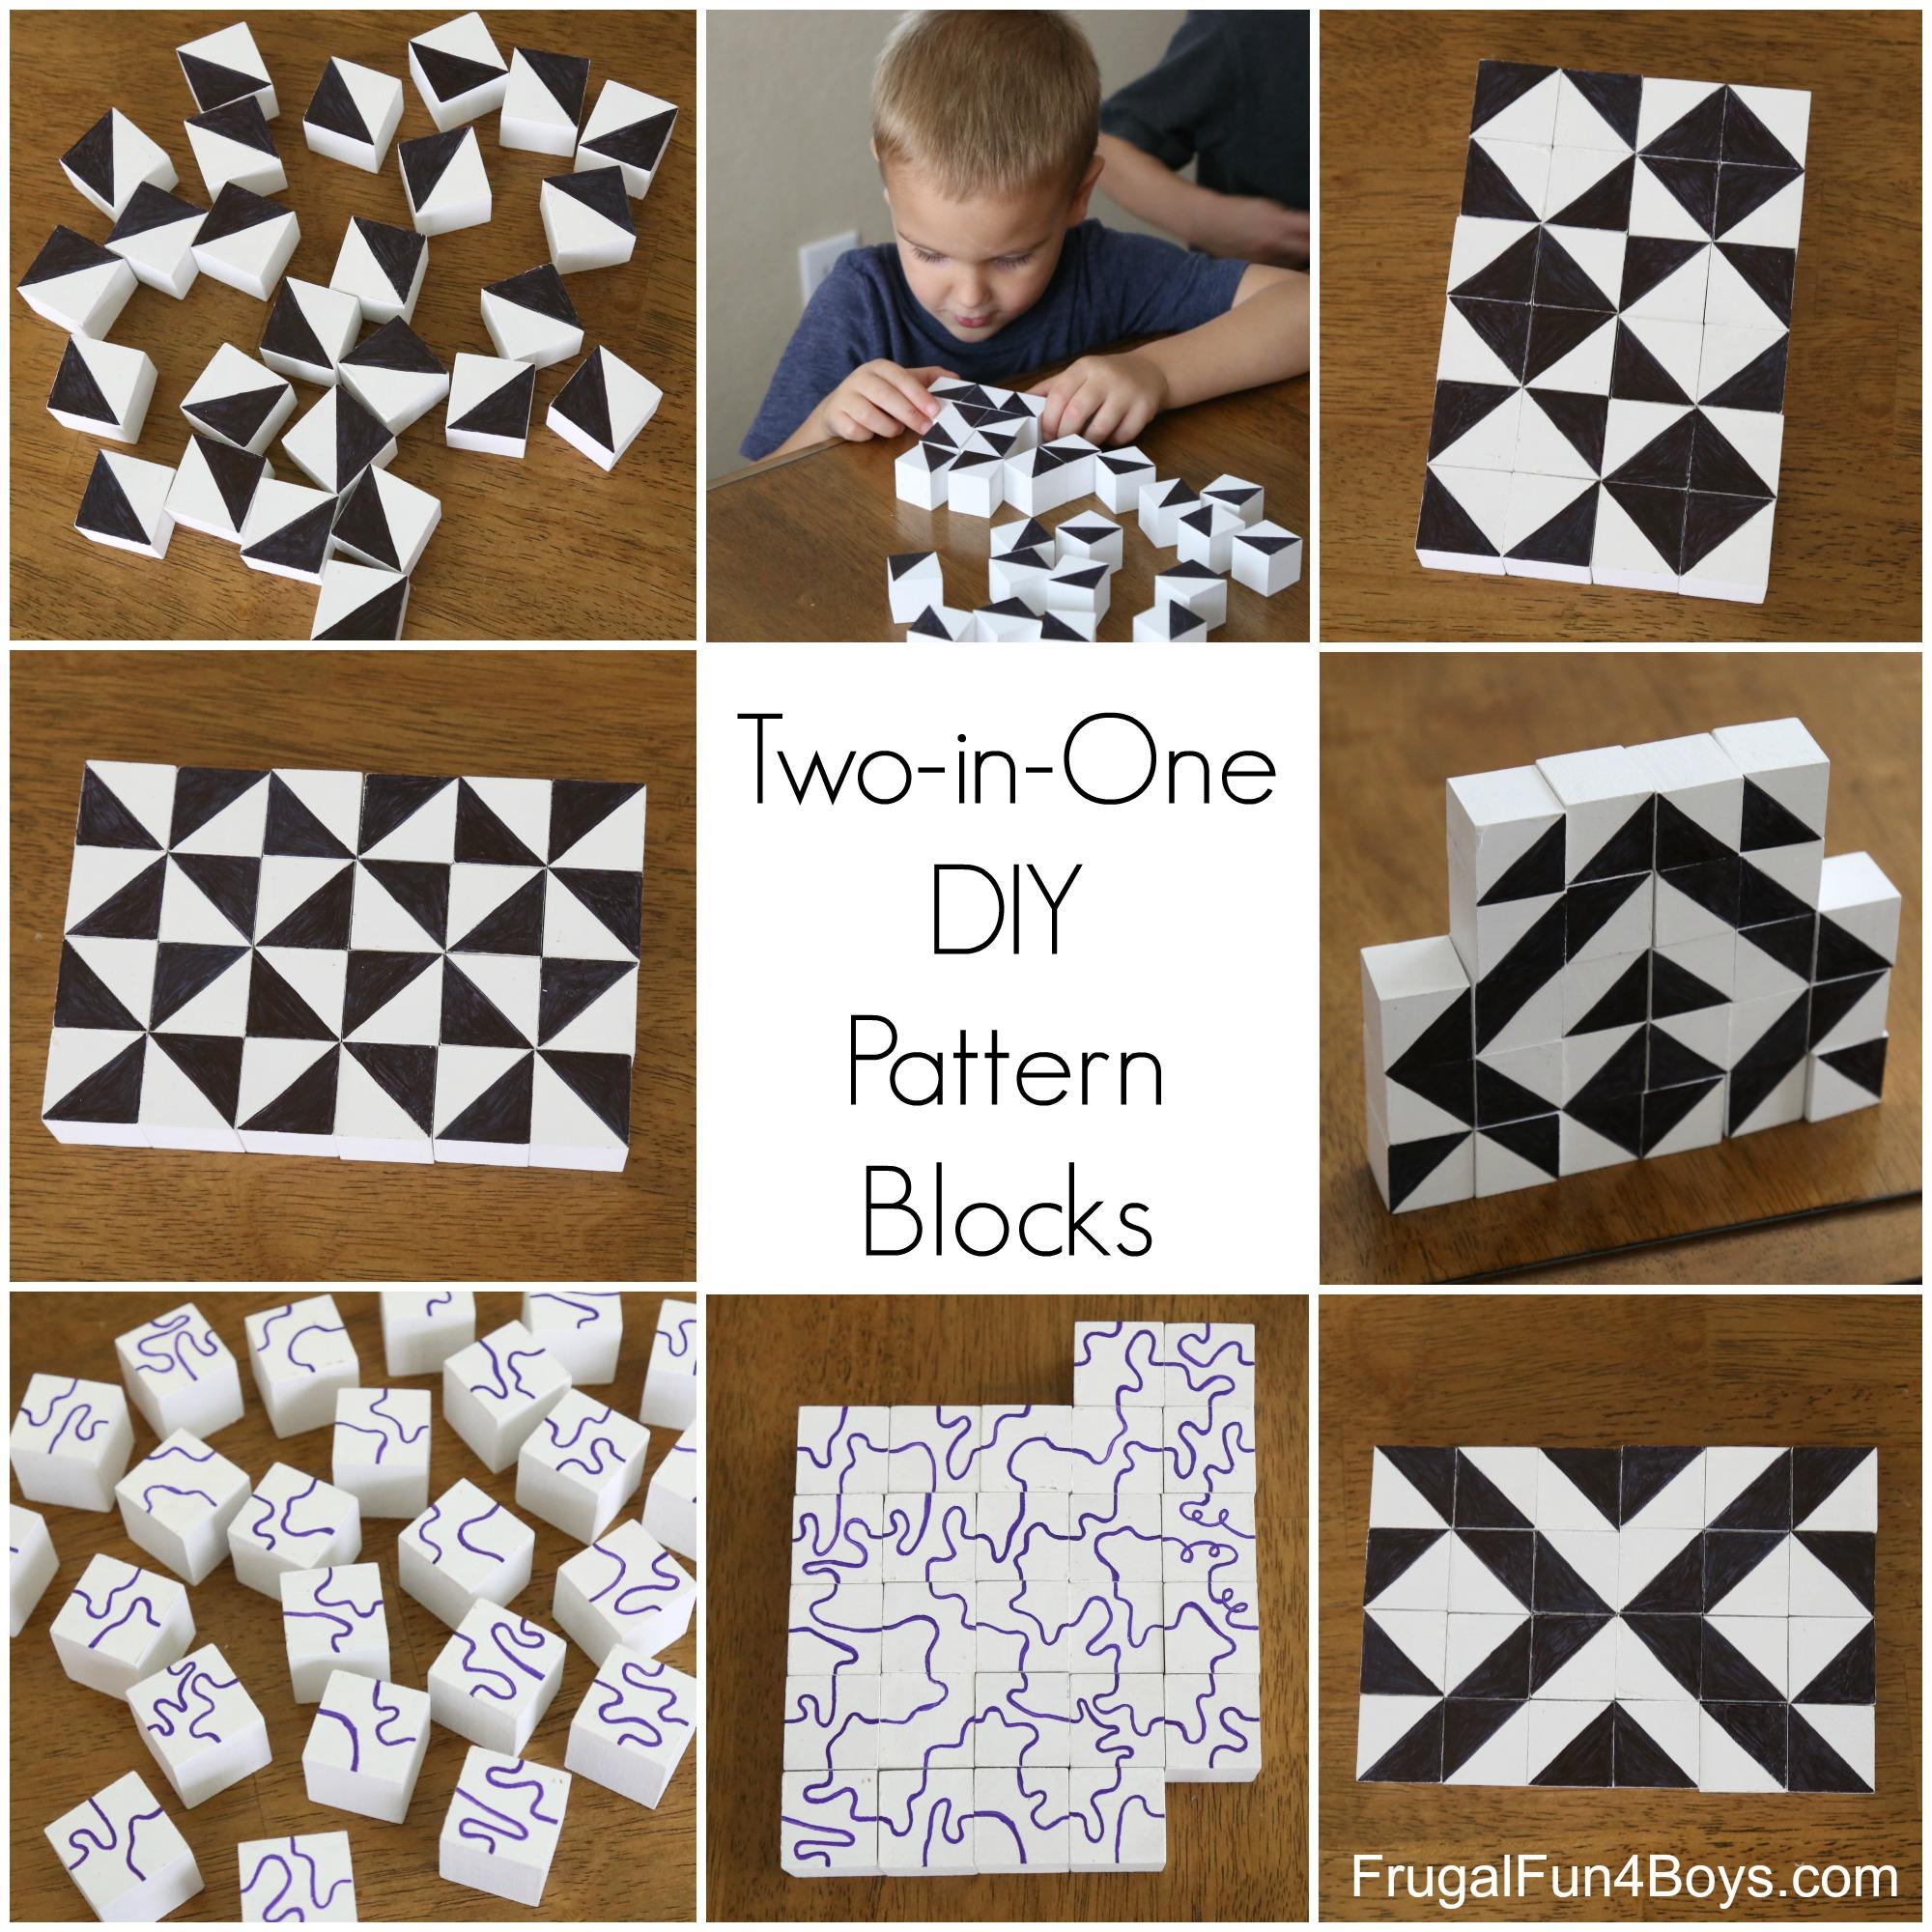 Two-in-One DIY Pattern Building Blocks